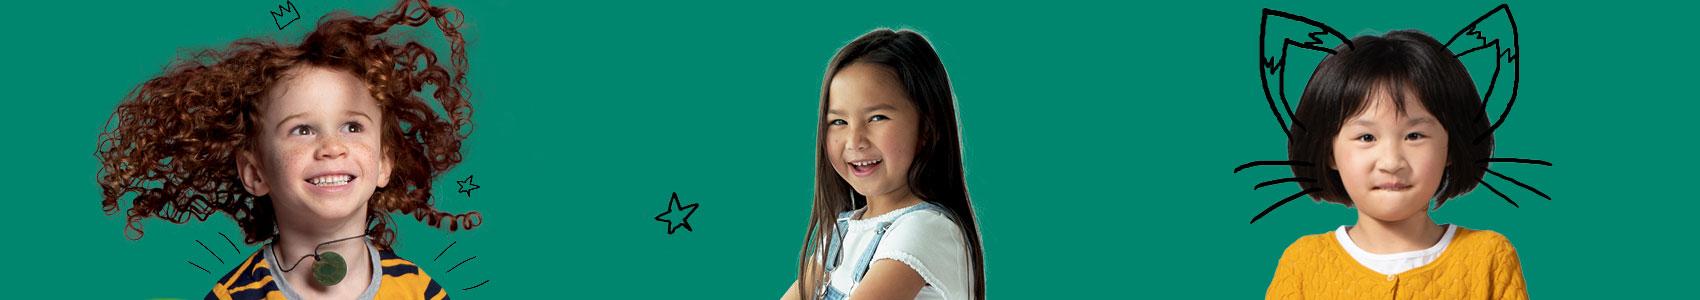 Auckland Live Kids 2020 - Media Release